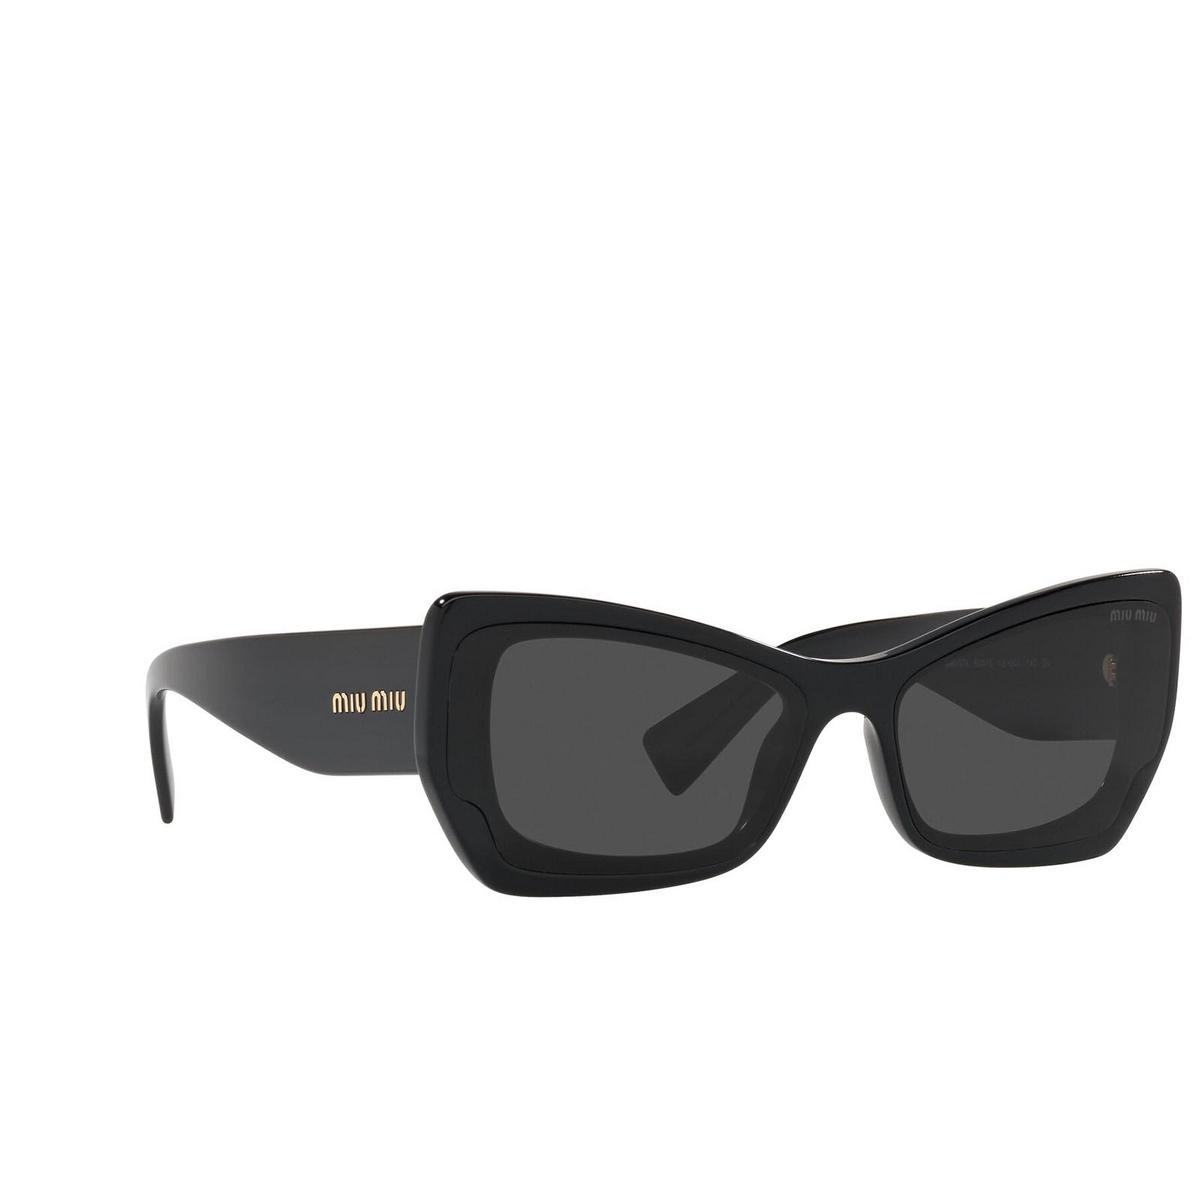 Miu Miu® Irregular Sunglasses: MU 07XS color Crystal Black 03I5S0.